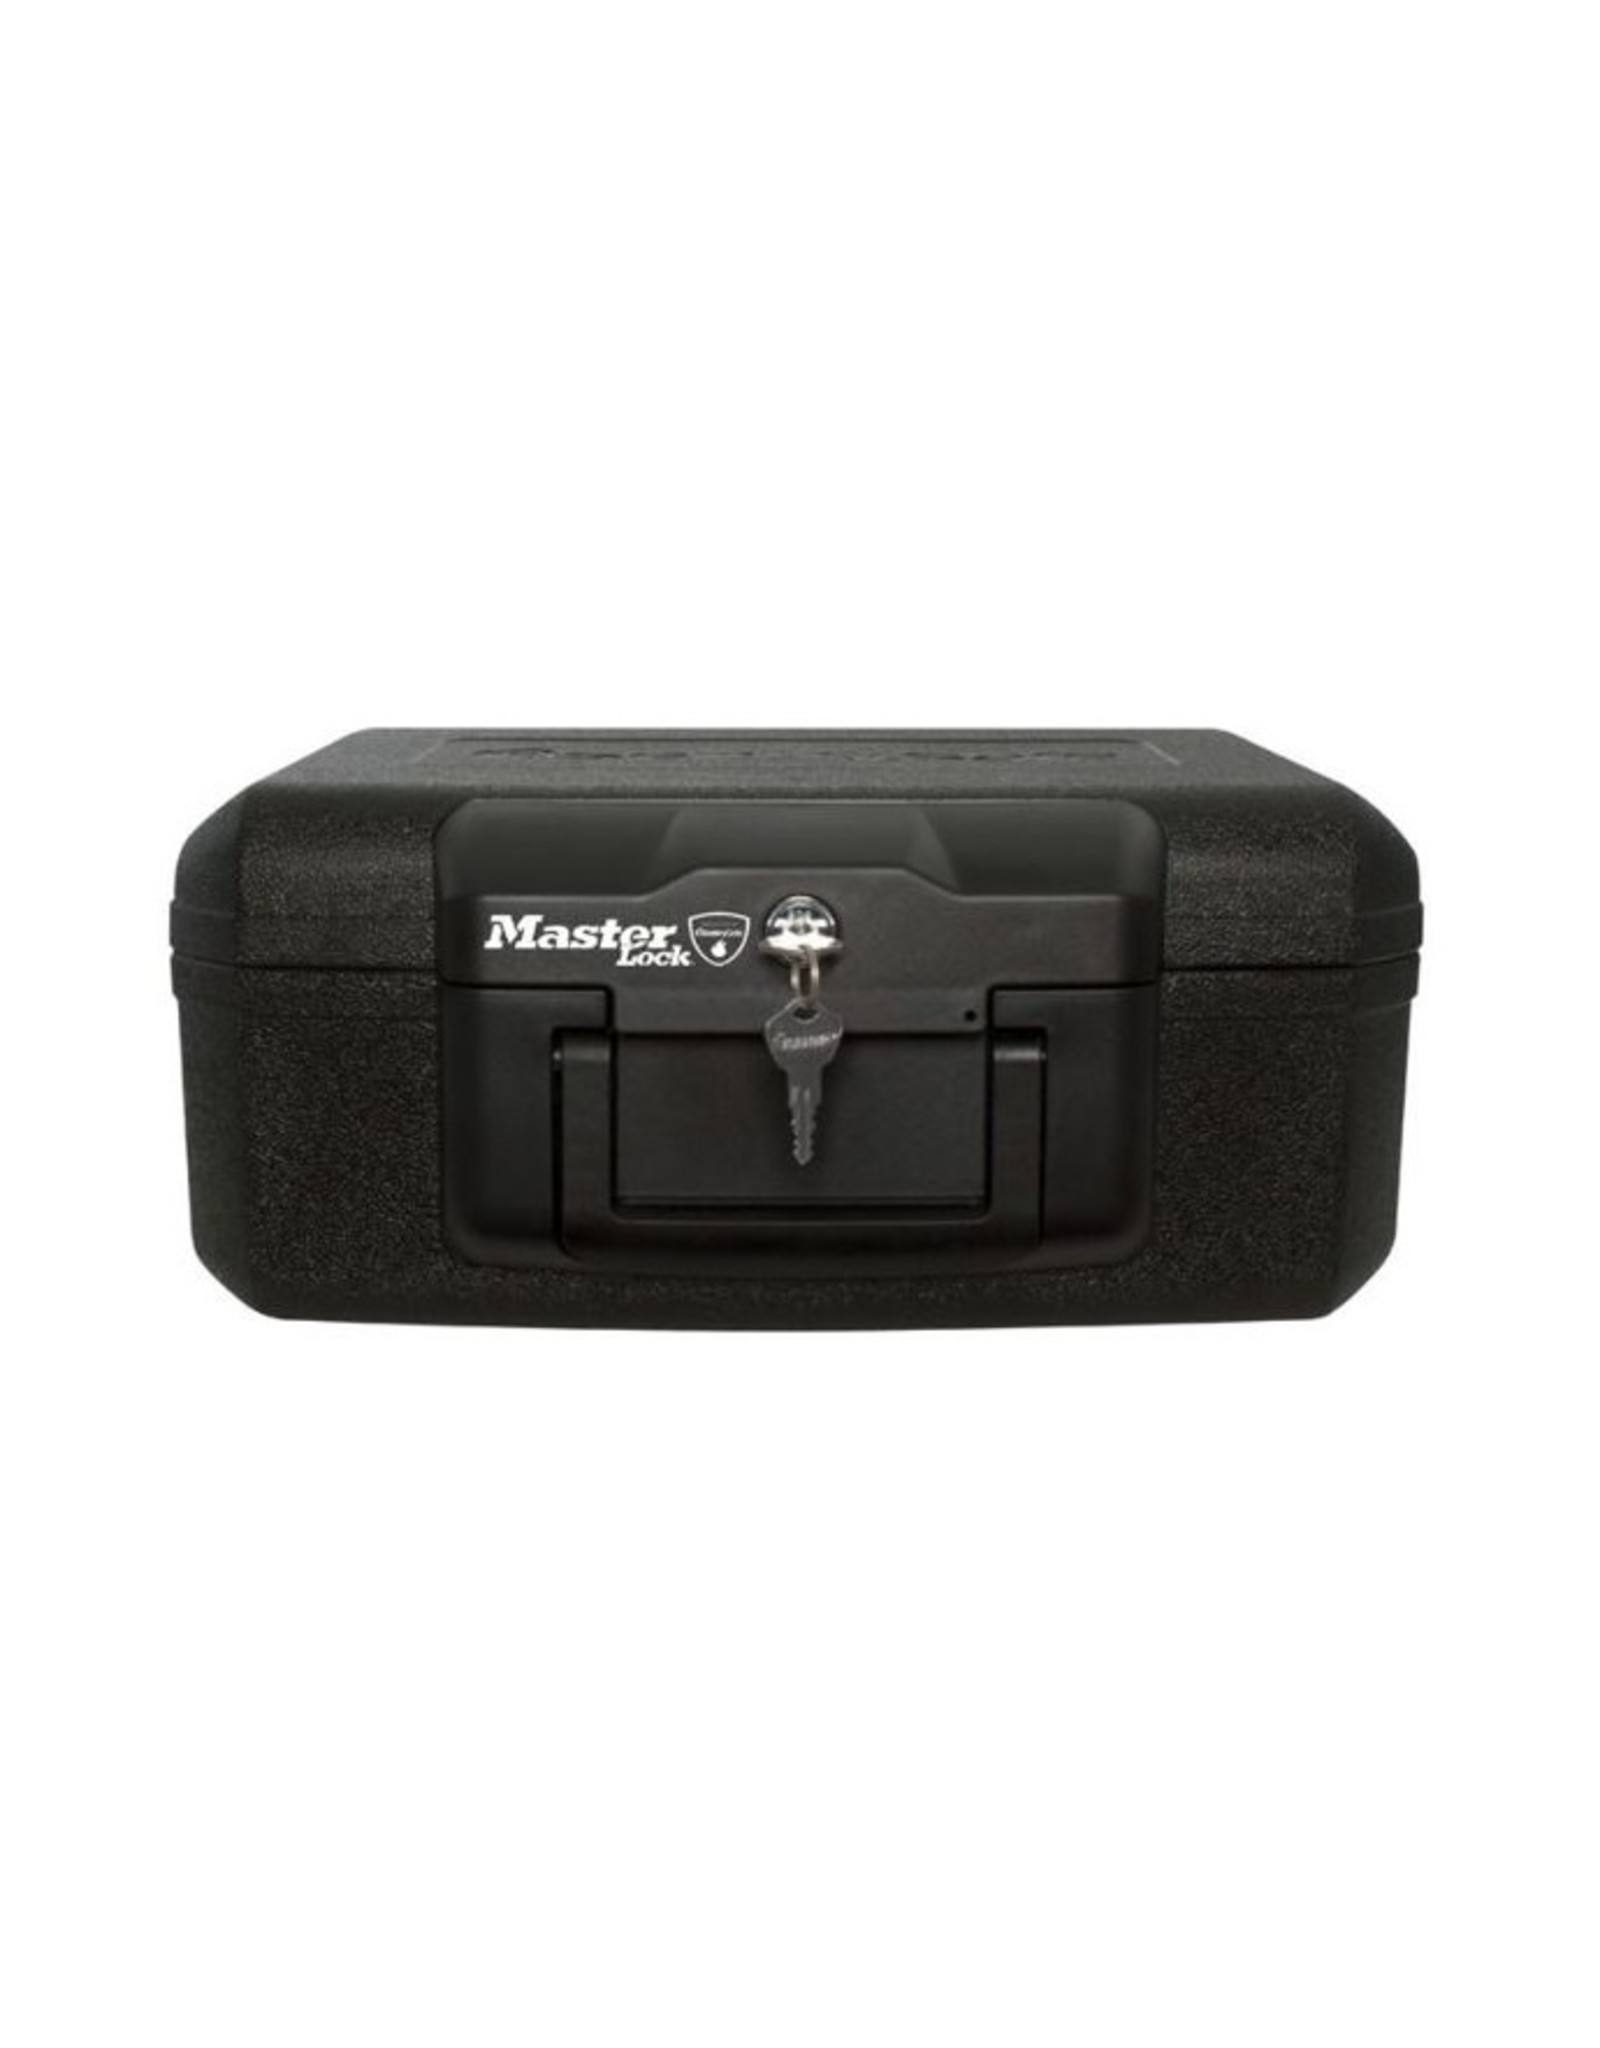 Masterlock Masterlock - Documentenkluis - Brandwerend